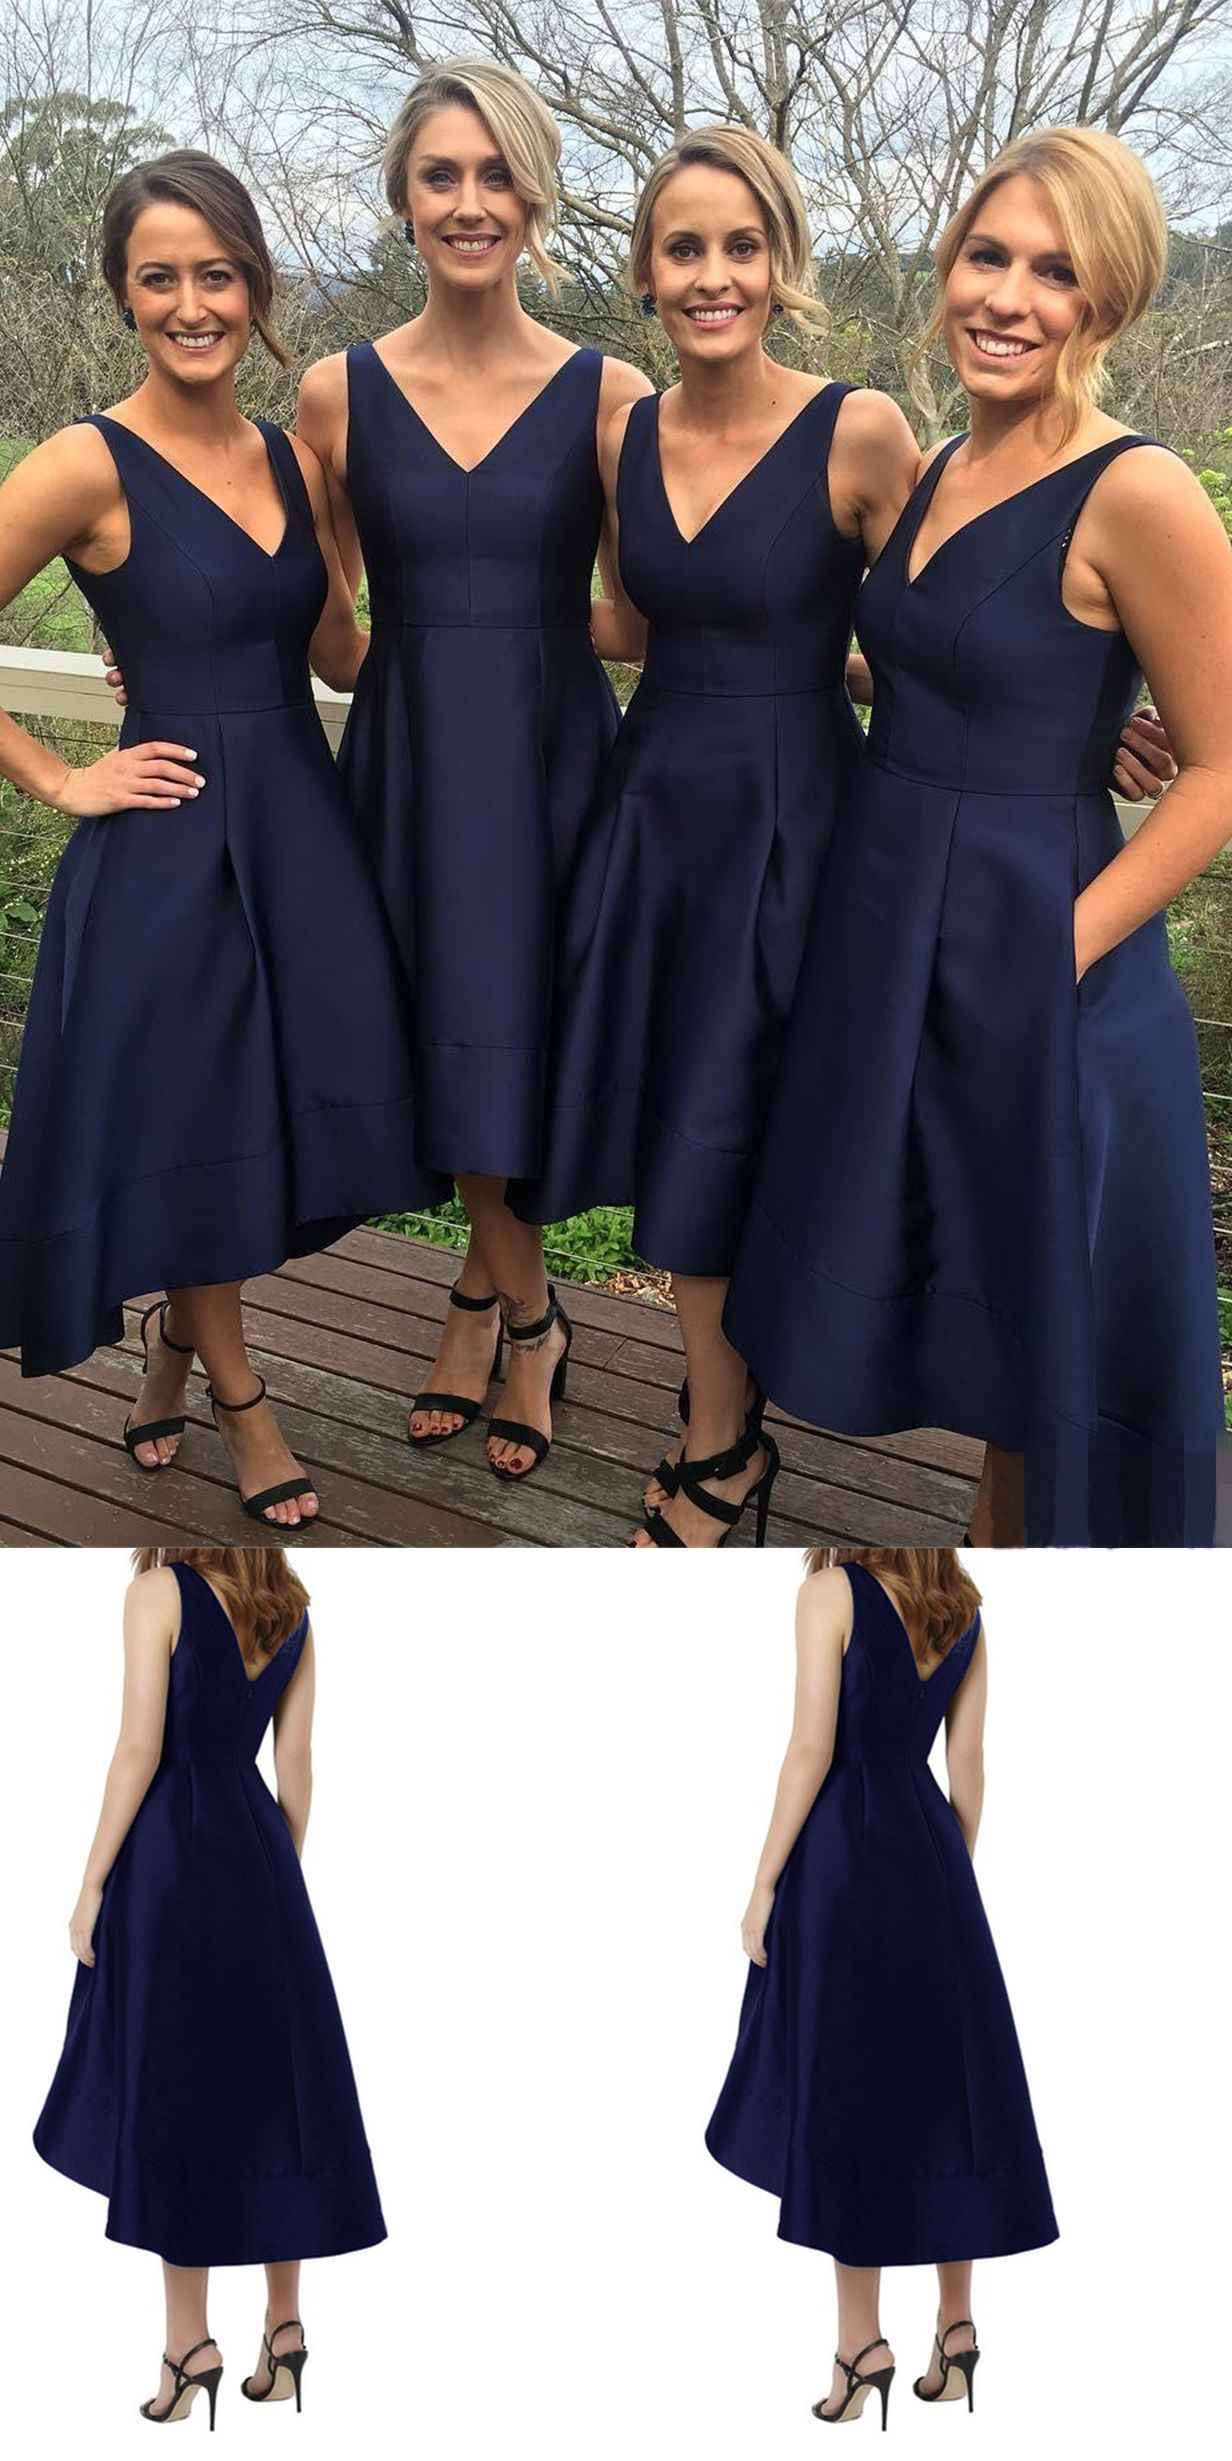 Classic bridesmaid dressesshort bridesmaid dressesaline